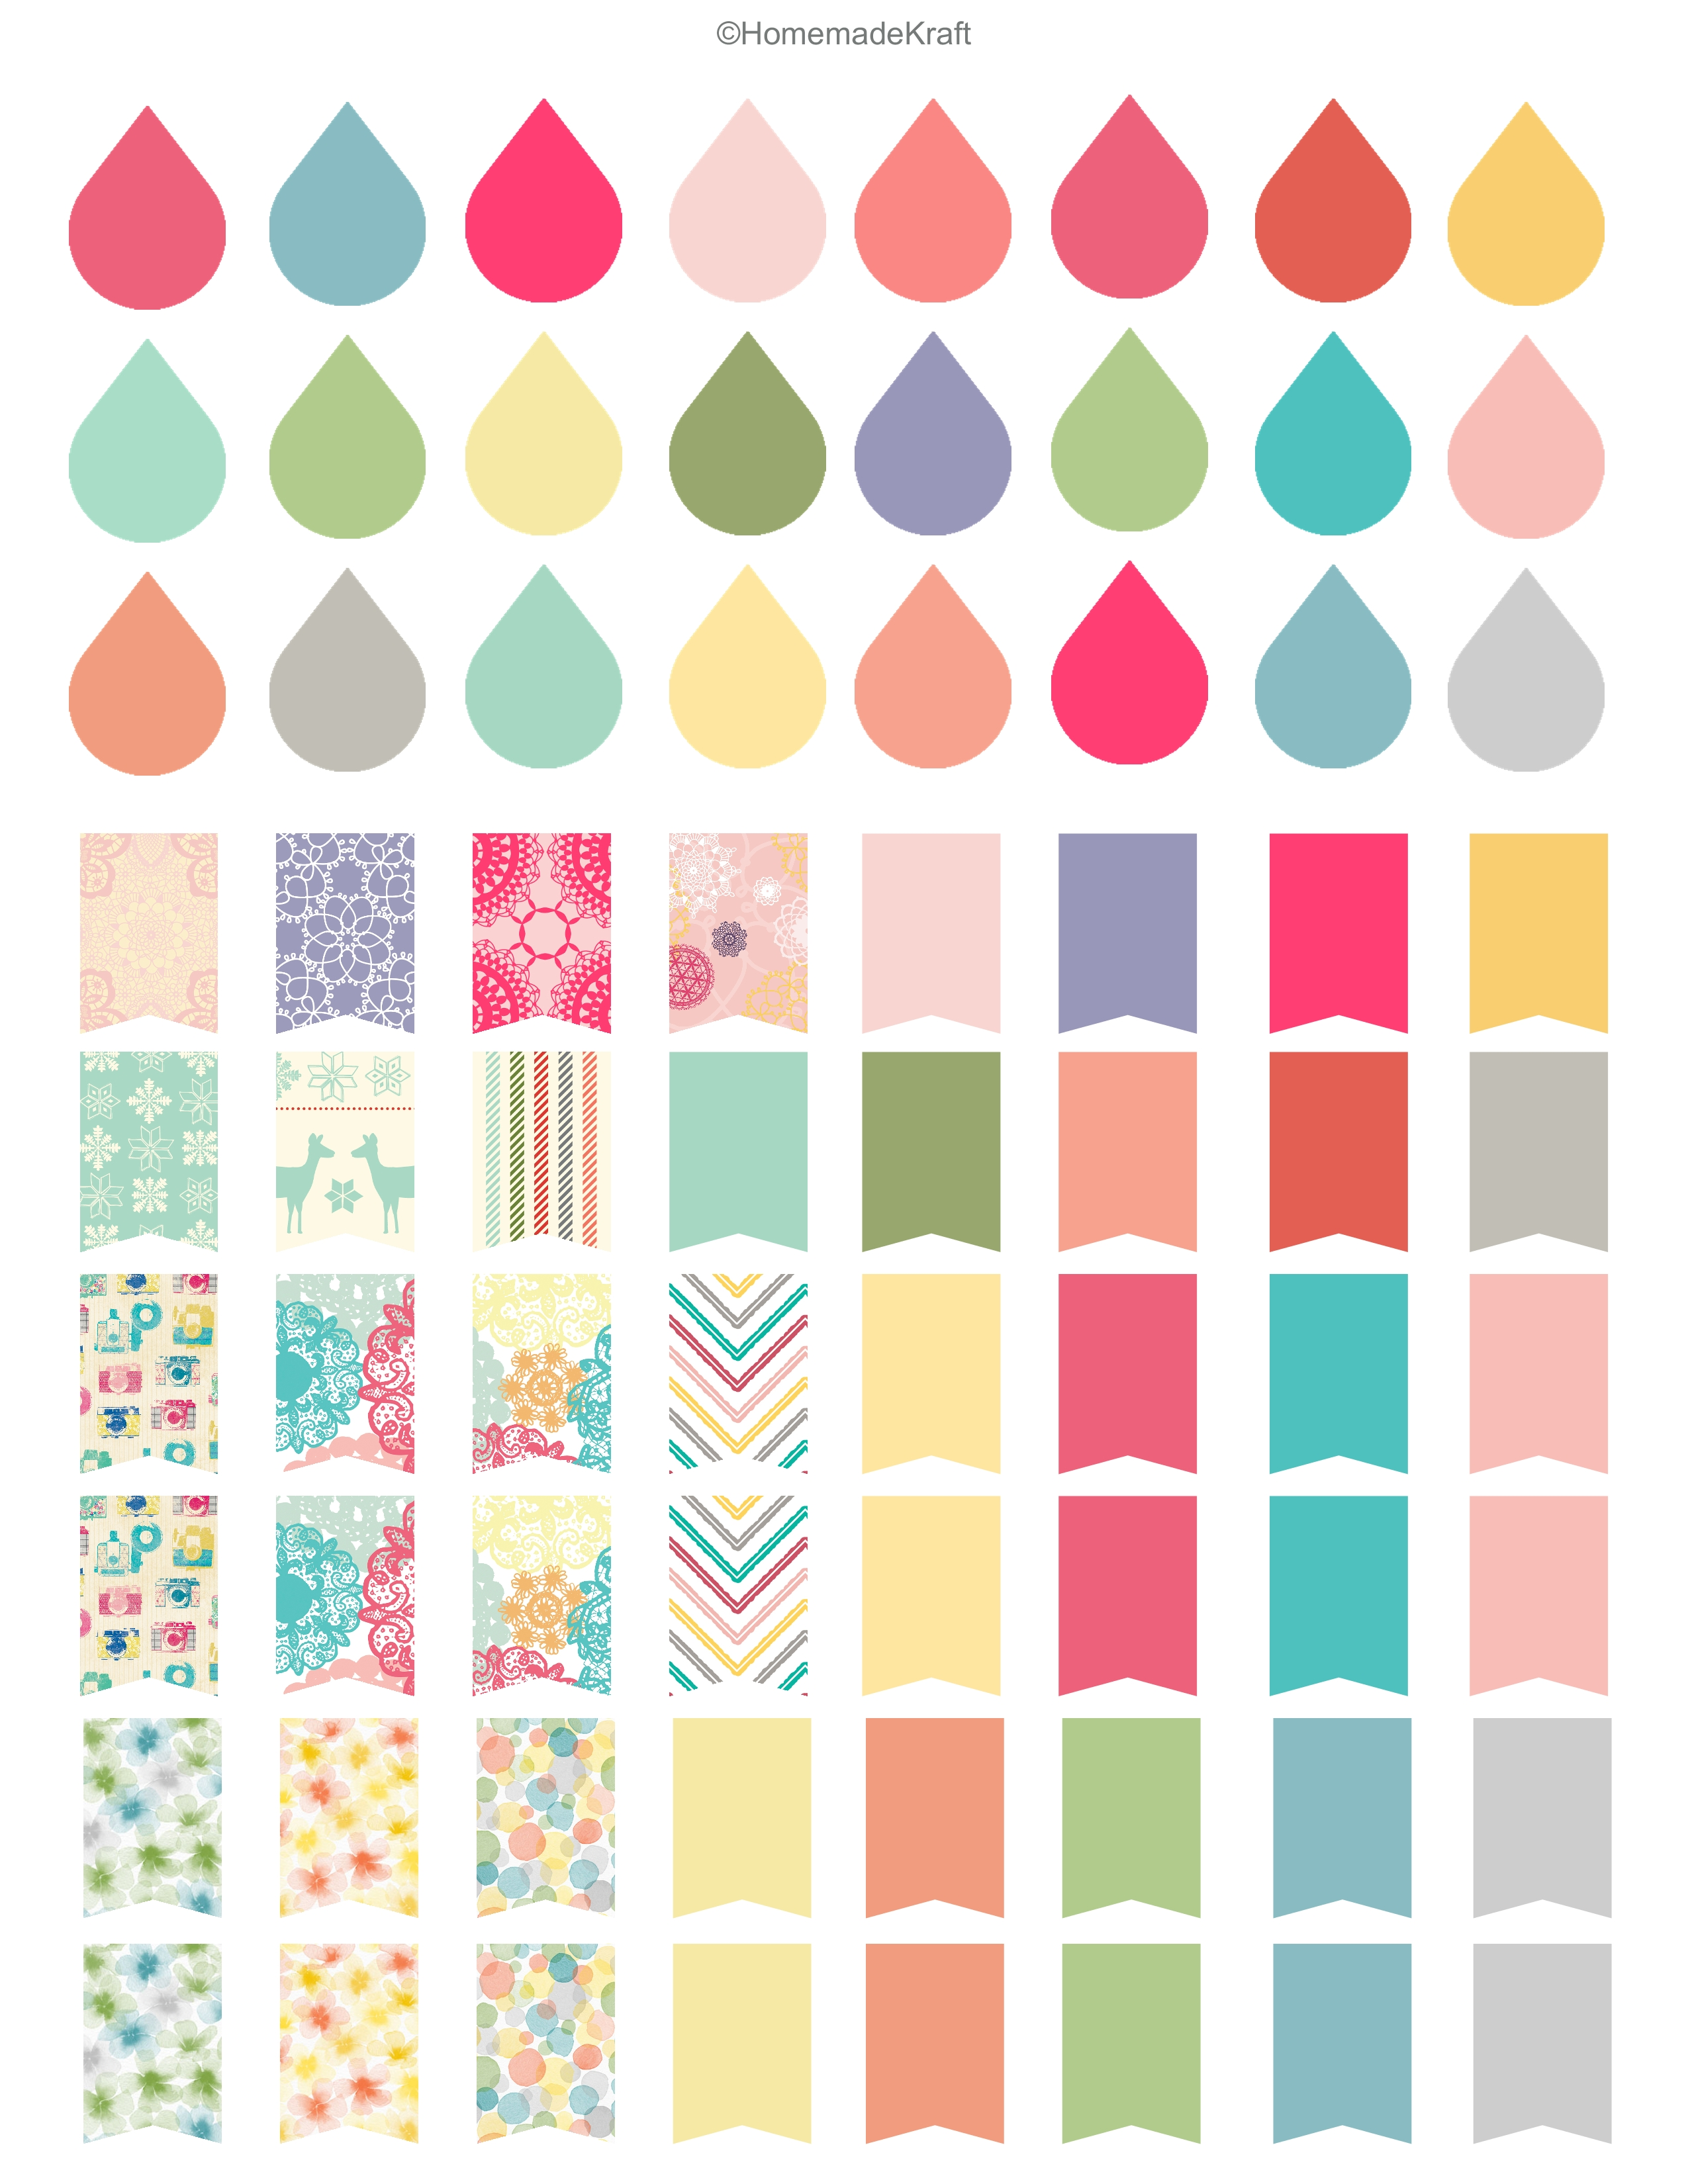 Printable Planner Sticker Sheets